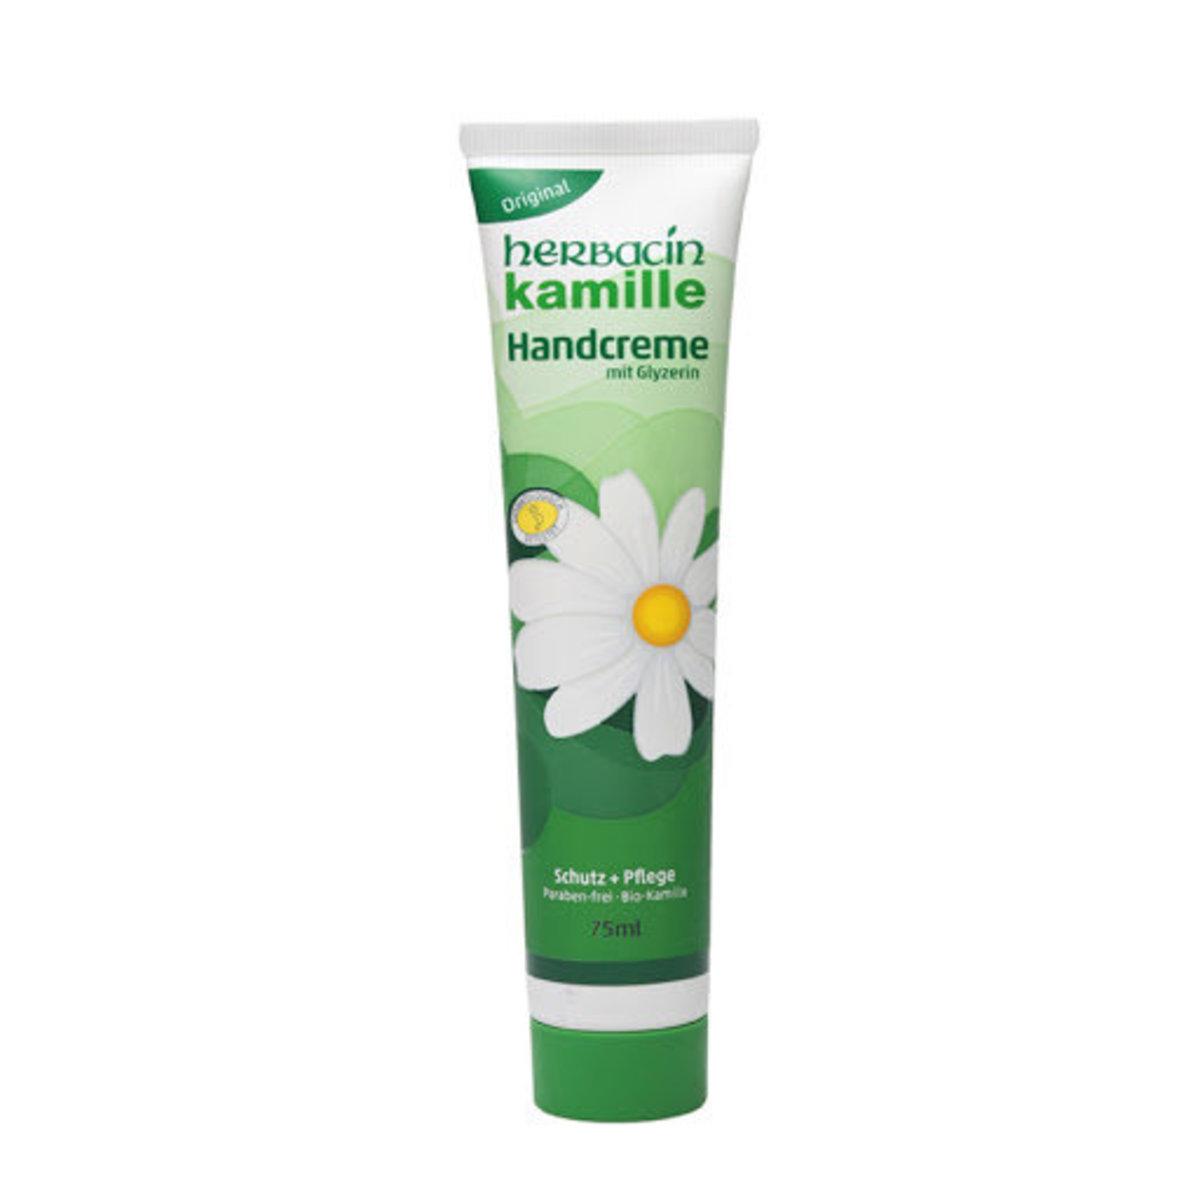 Herbacin Kamille Hand Cream with Glycerine 75ml(Parallel import)